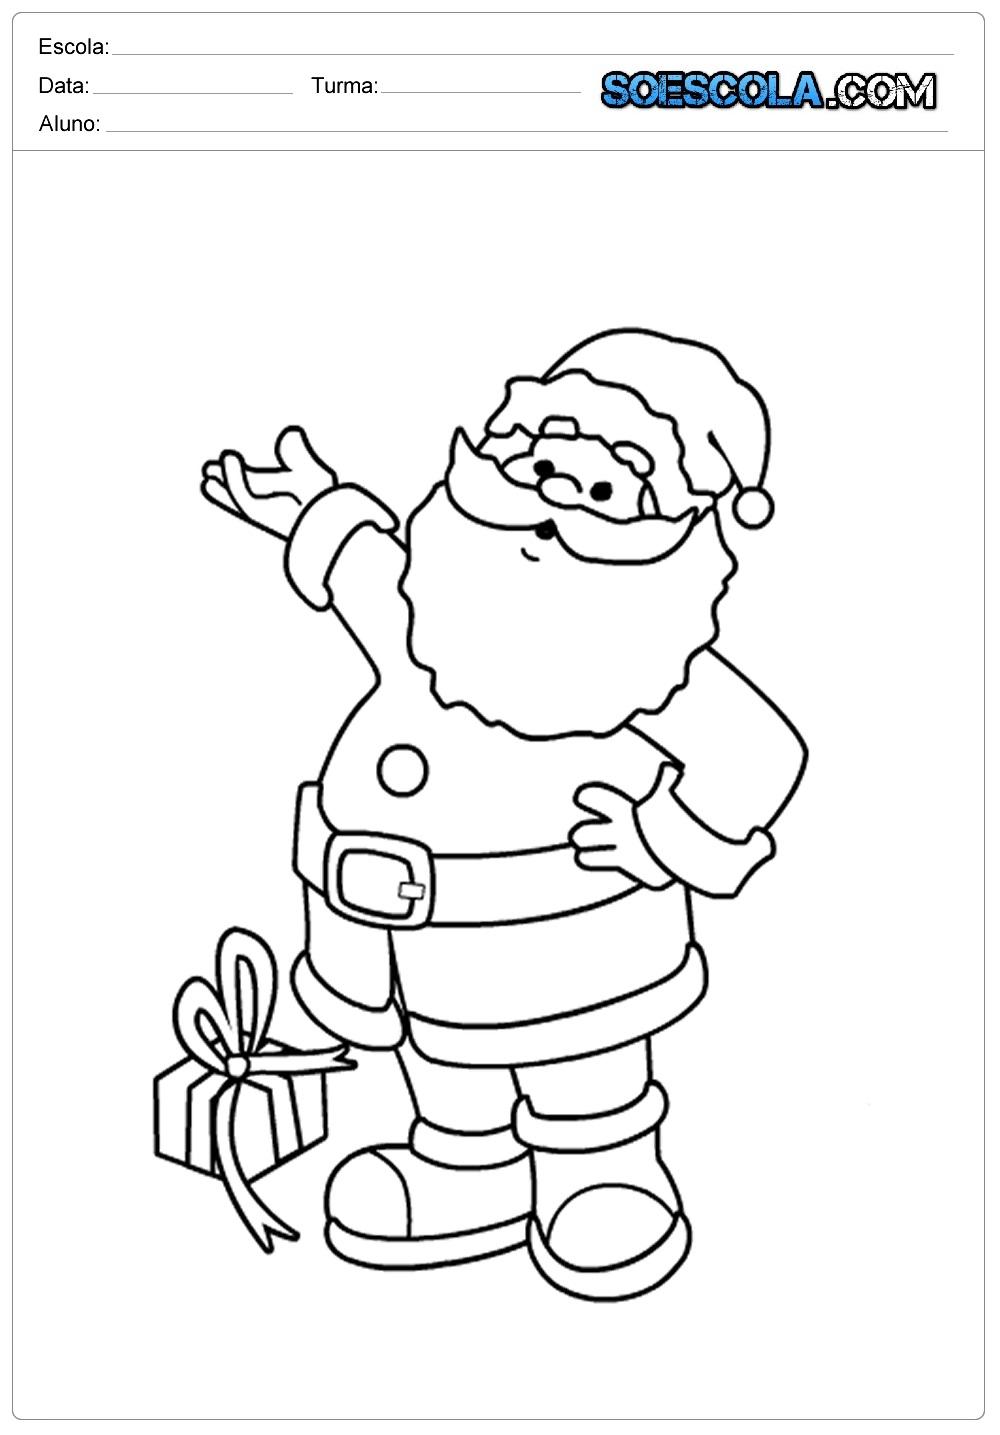 20 Desenhos de Natal para Colorir e Imprimir - Papai Noel em PDF.